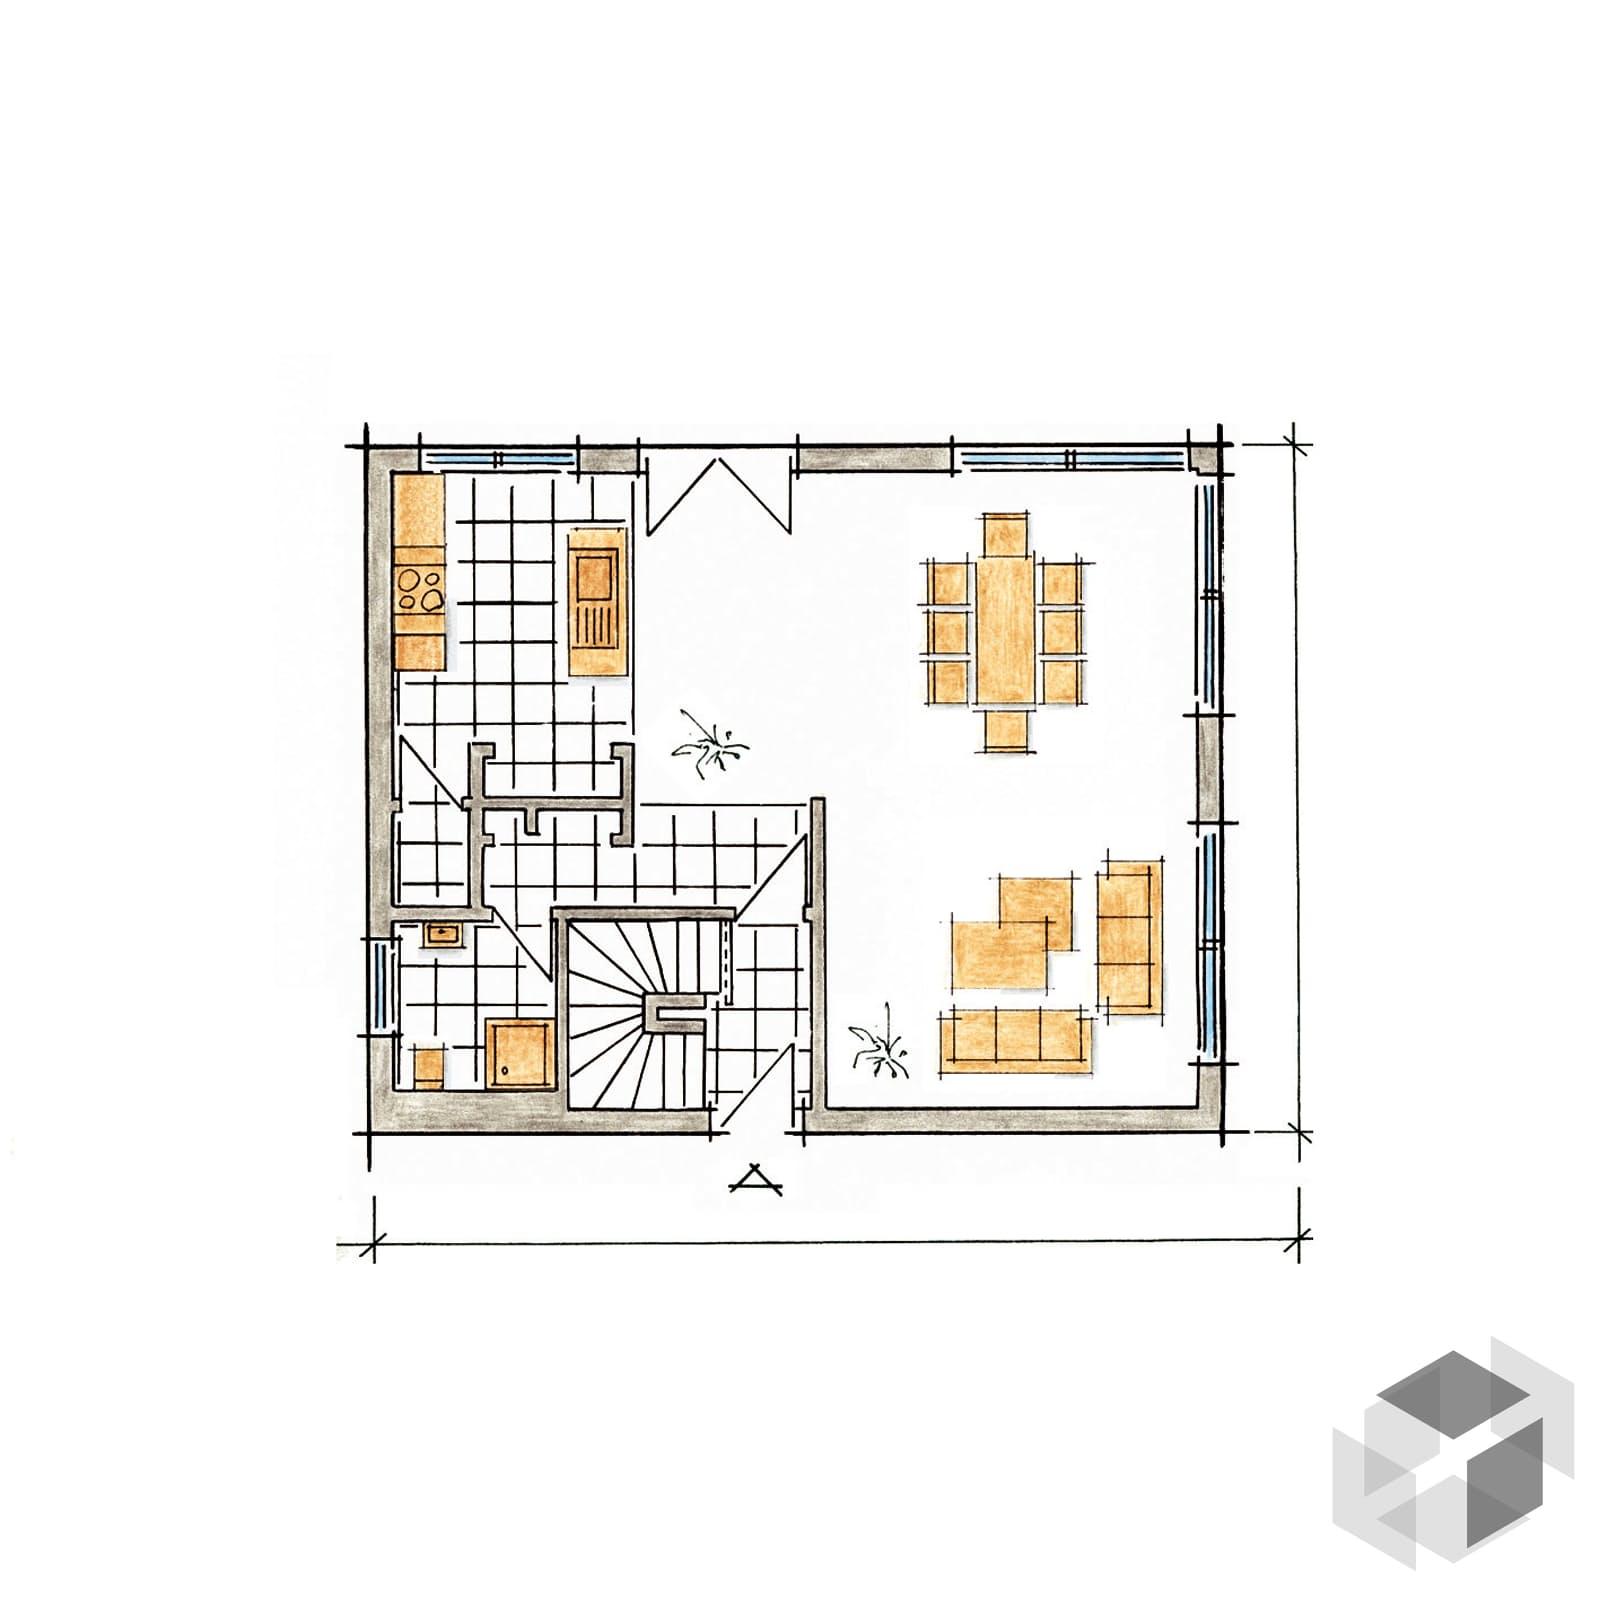 gr nwald von gussek haus komplette daten bersicht. Black Bedroom Furniture Sets. Home Design Ideas